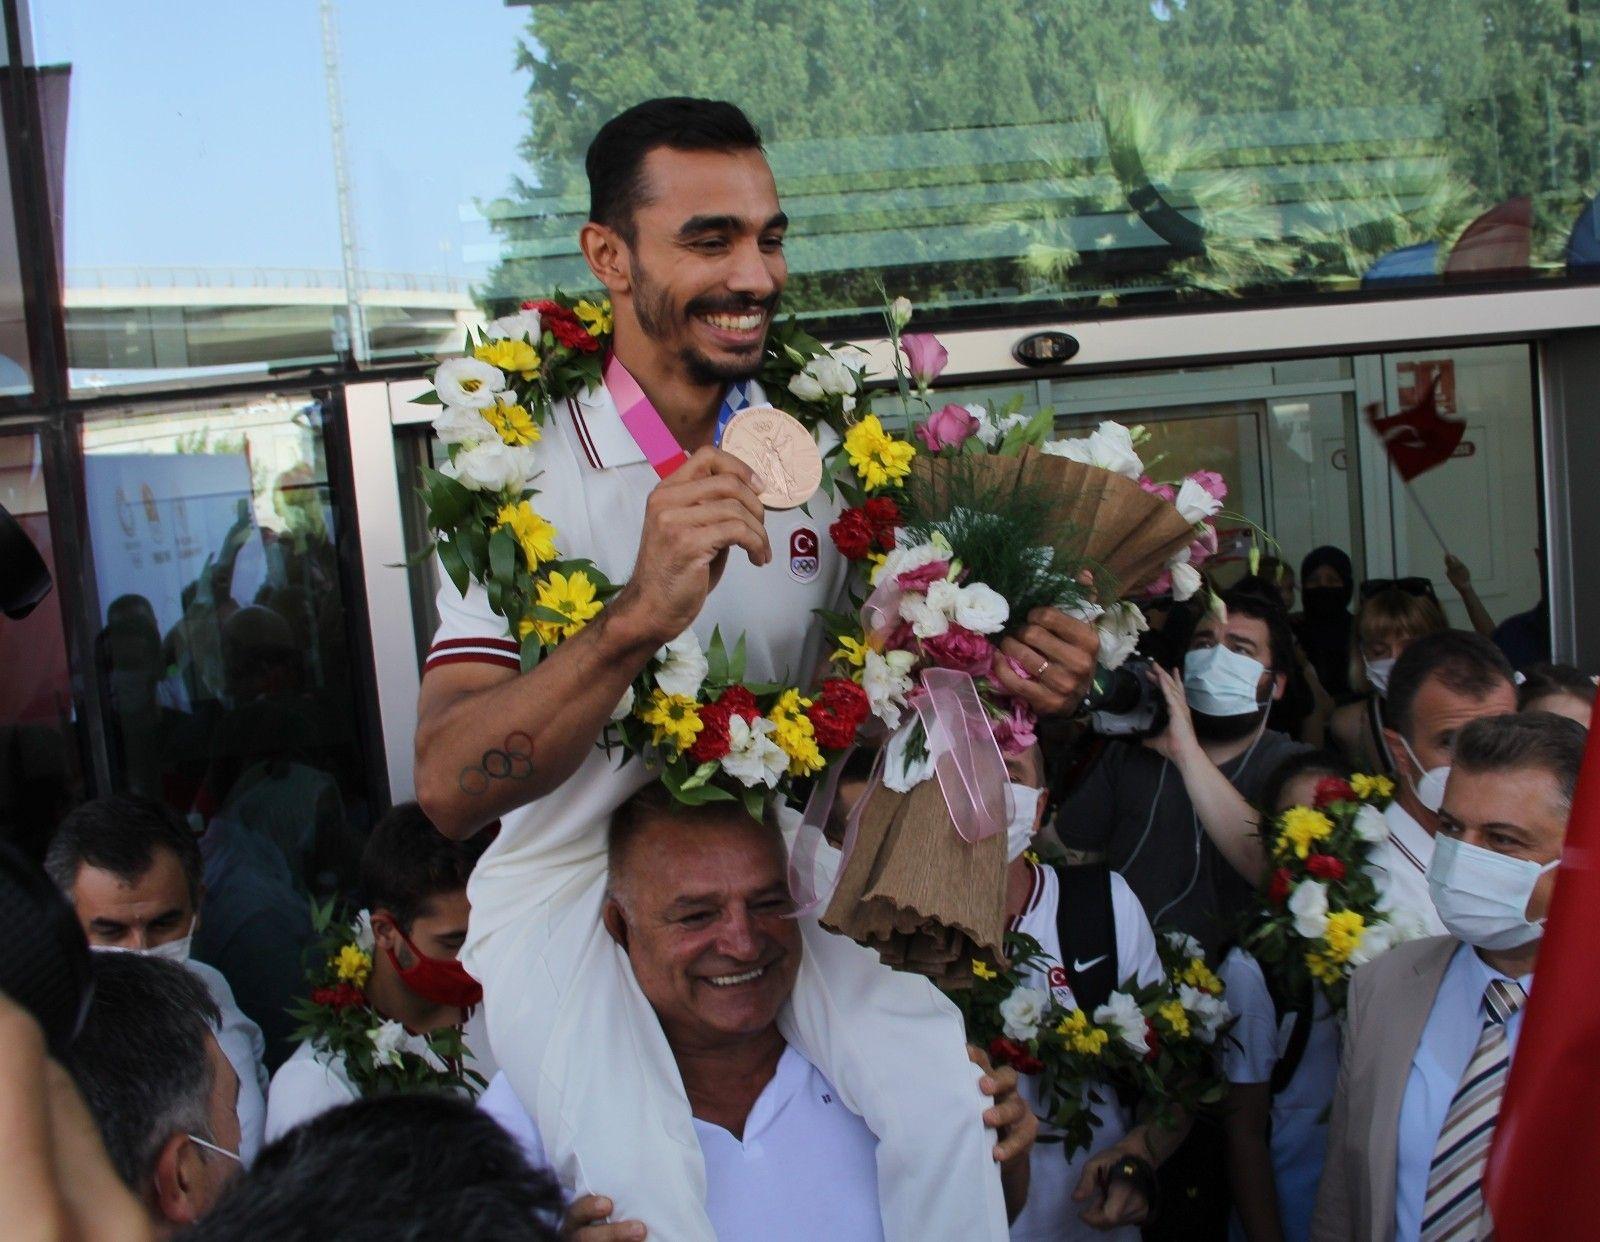 2021/08/olimpiyat-madalyali-aricana-izmirde-coskulu-karsilama-20210805AW38-1.jpg